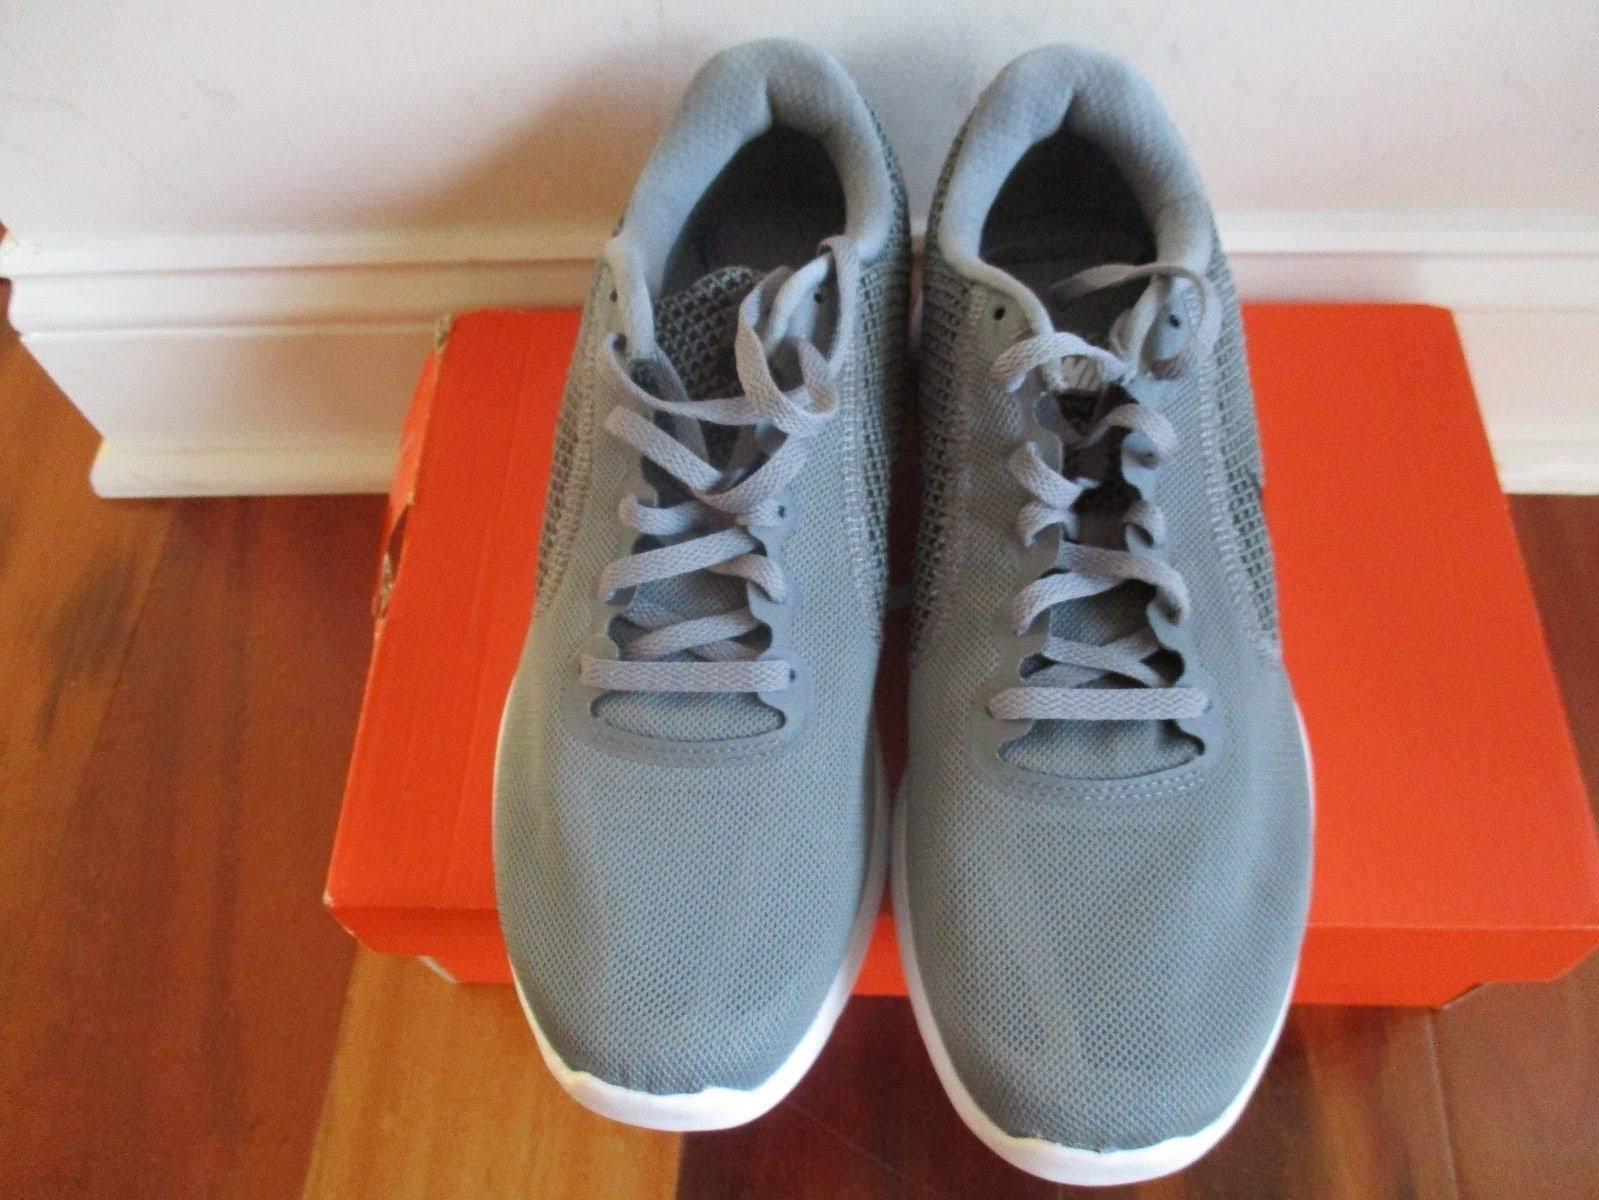 Style Nike Mens Revolution 819300 8 3 Größe Grau Zqqtw4zn1